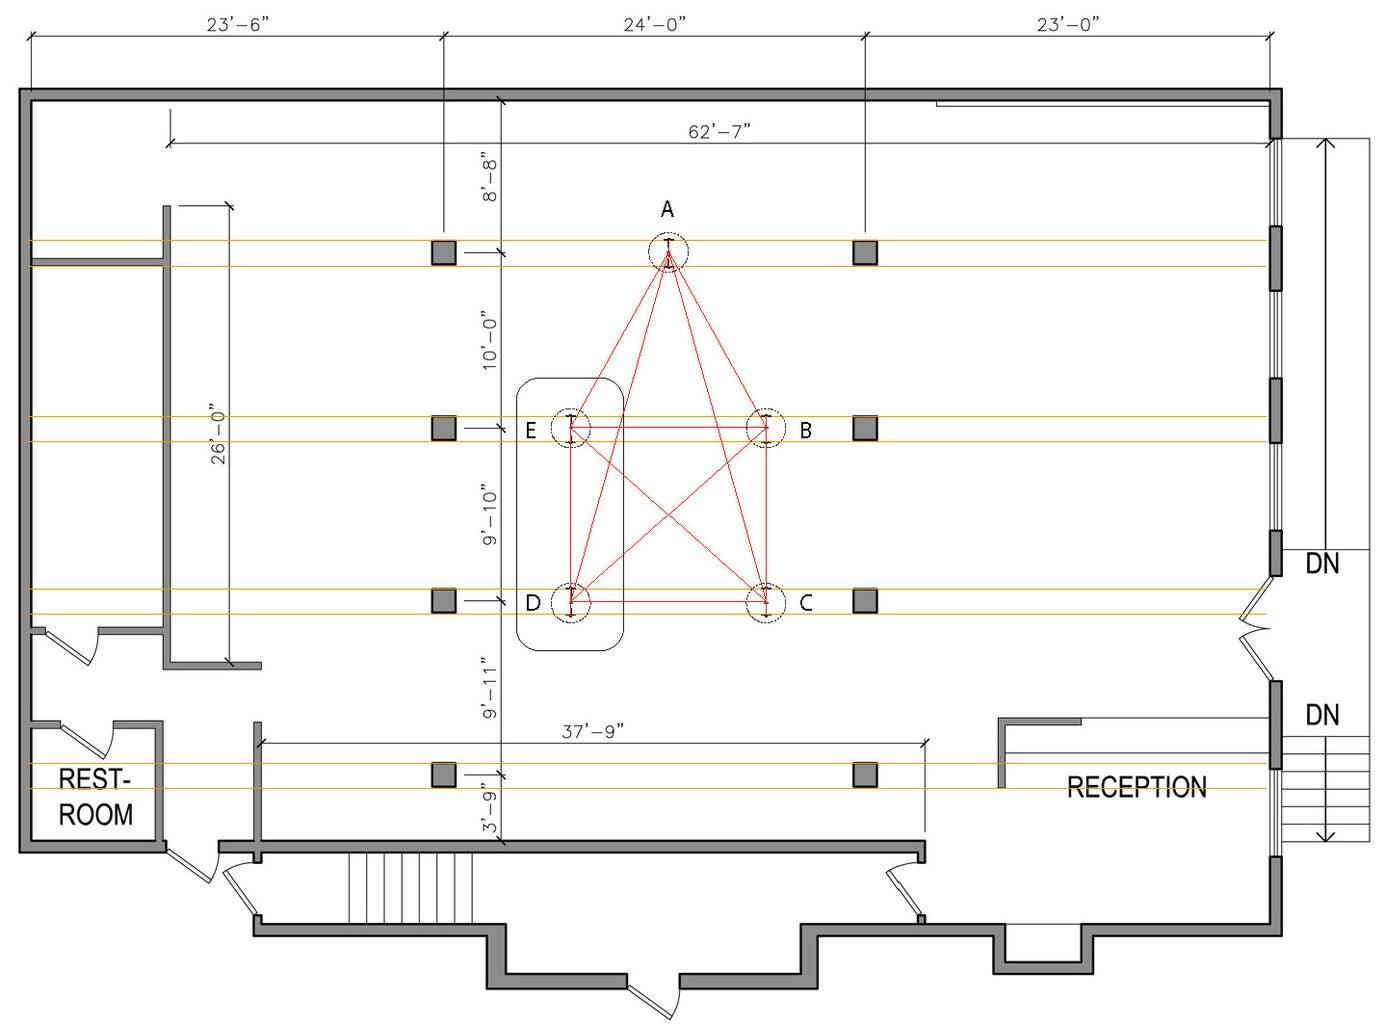 Hammock Configuration